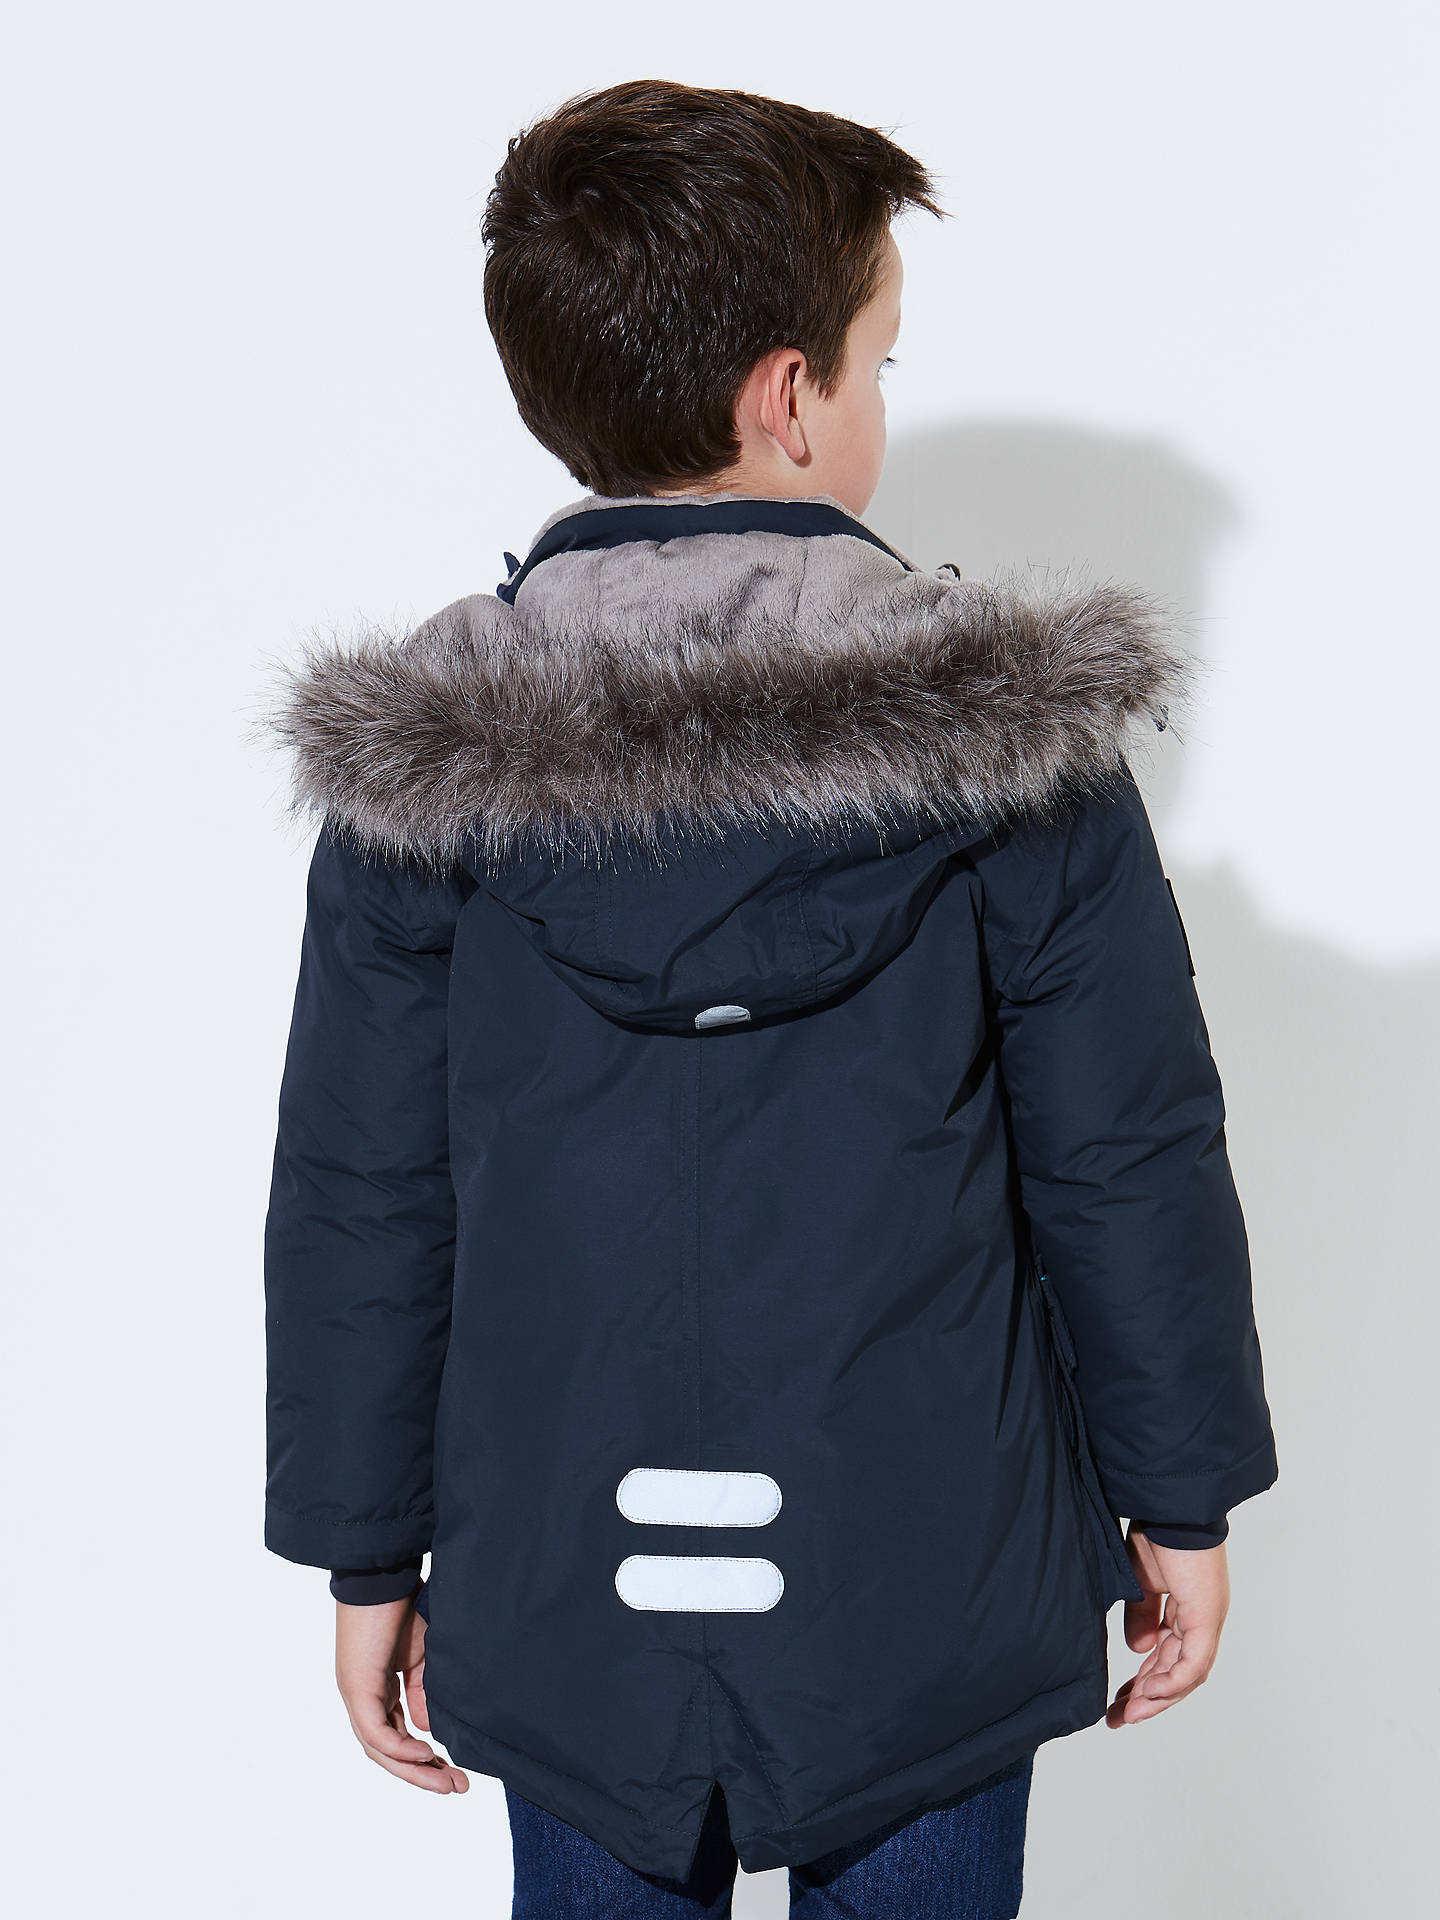 5de8a927957 ... Buy John Lewis Boys' Padded Parka Jacket, Navy, 2 years Online at  johnlewis ...